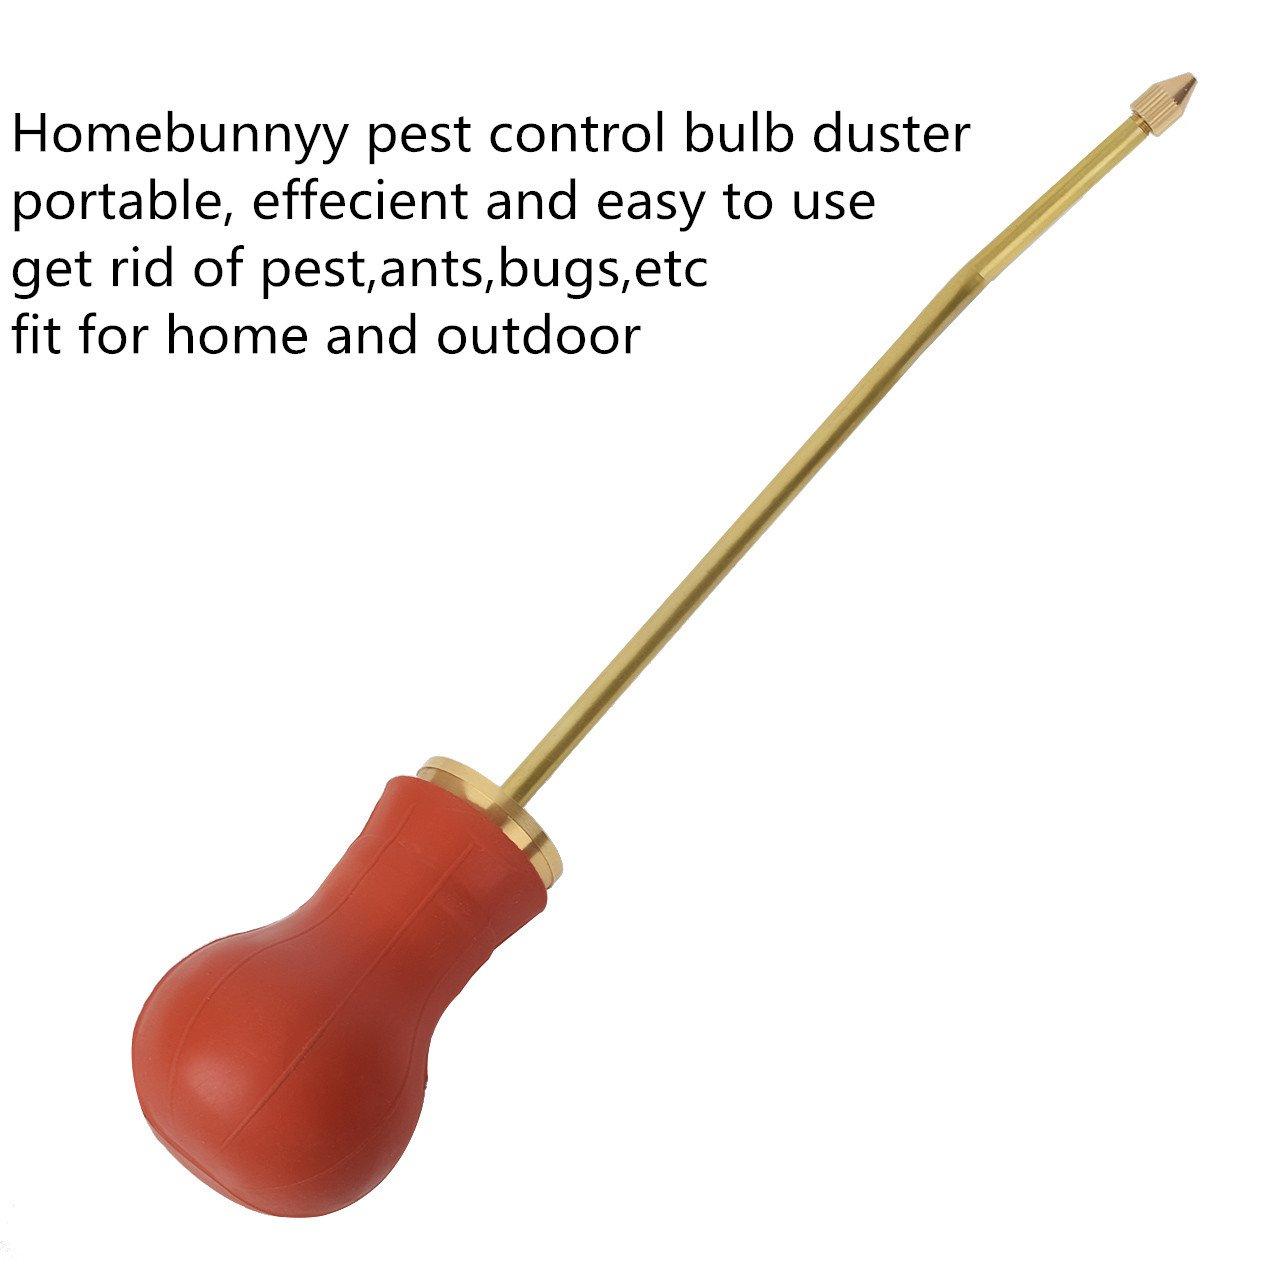 Homebunnyy Control de Plagas Insectos Plumero Bombilla Plumero Bulbo Dispensador de Insecticida Pulverizador de Plaguicidas: Amazon.es: Hogar